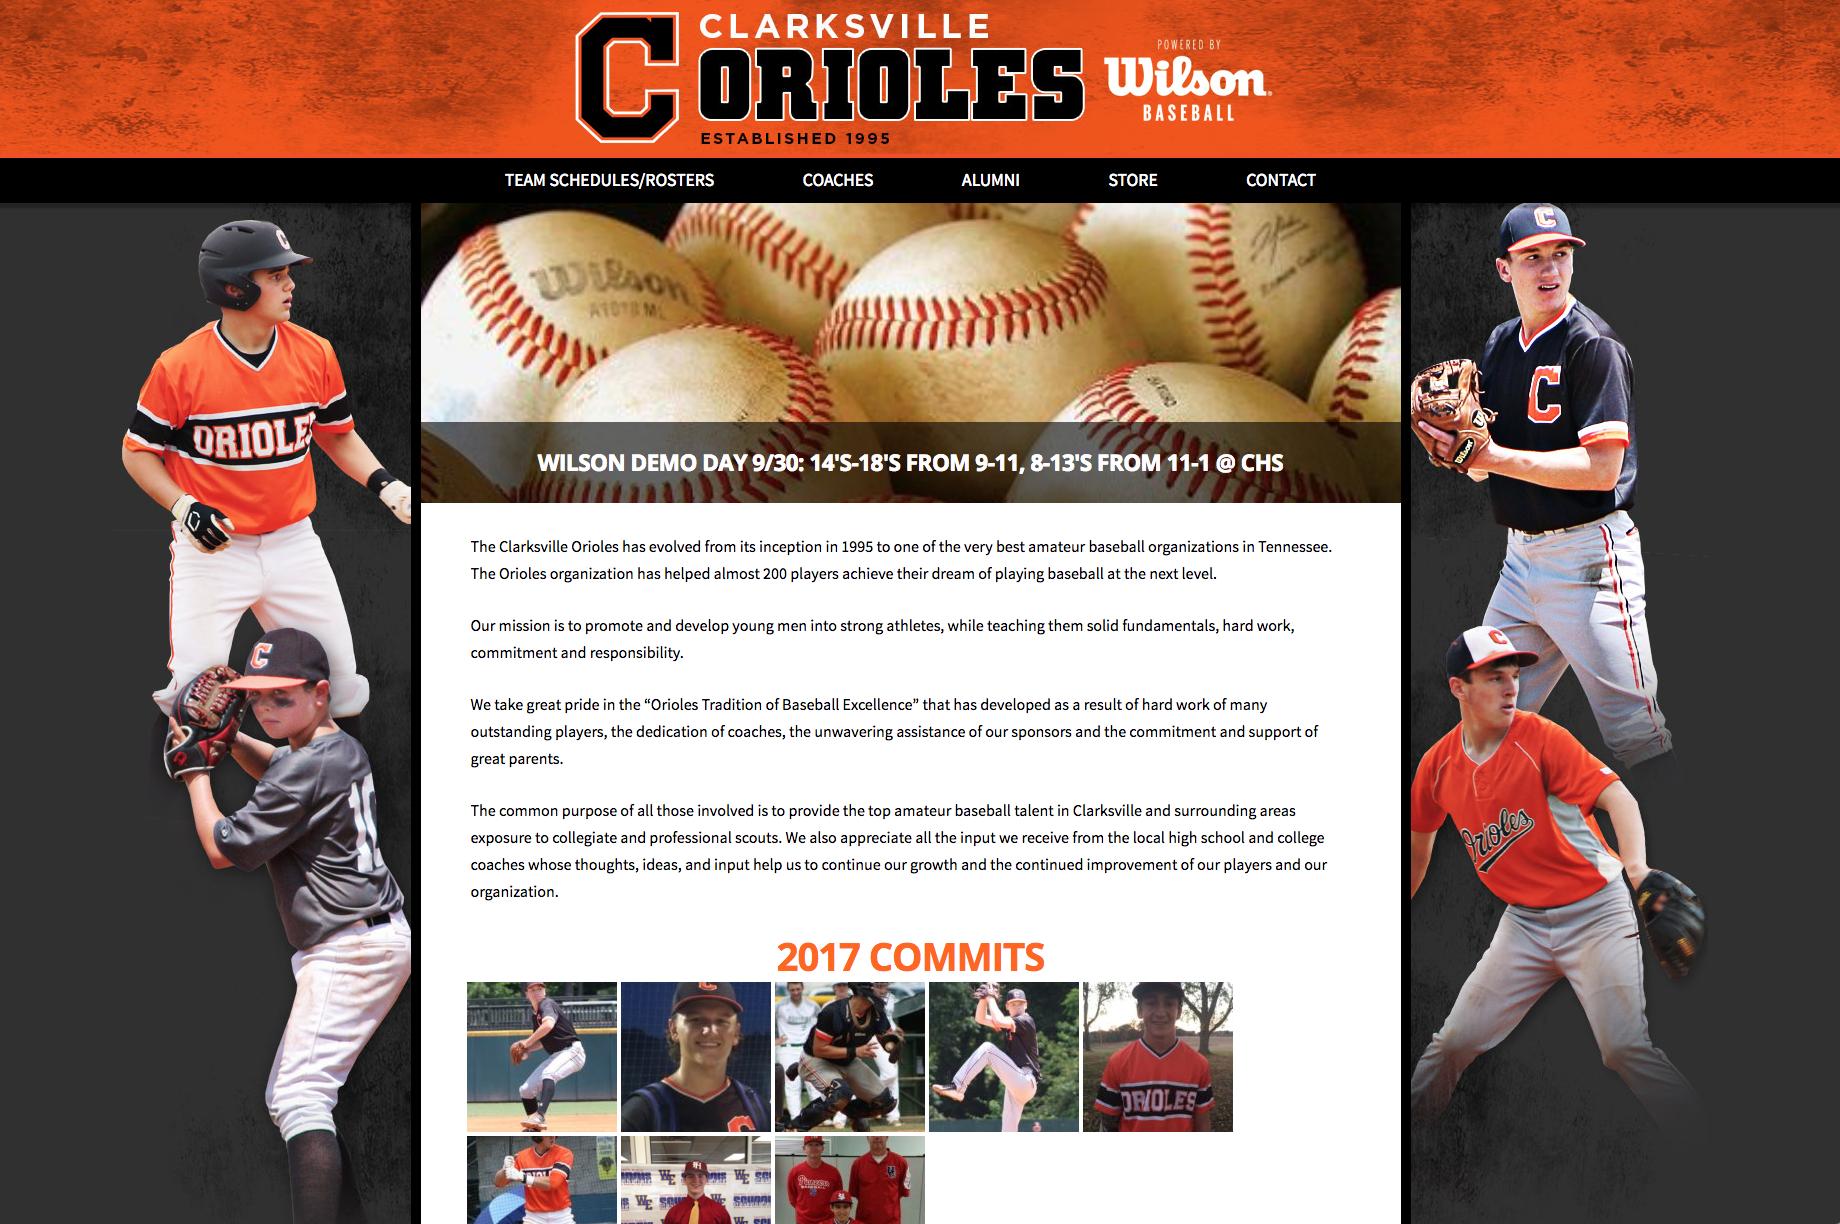 Clarksville Orioles